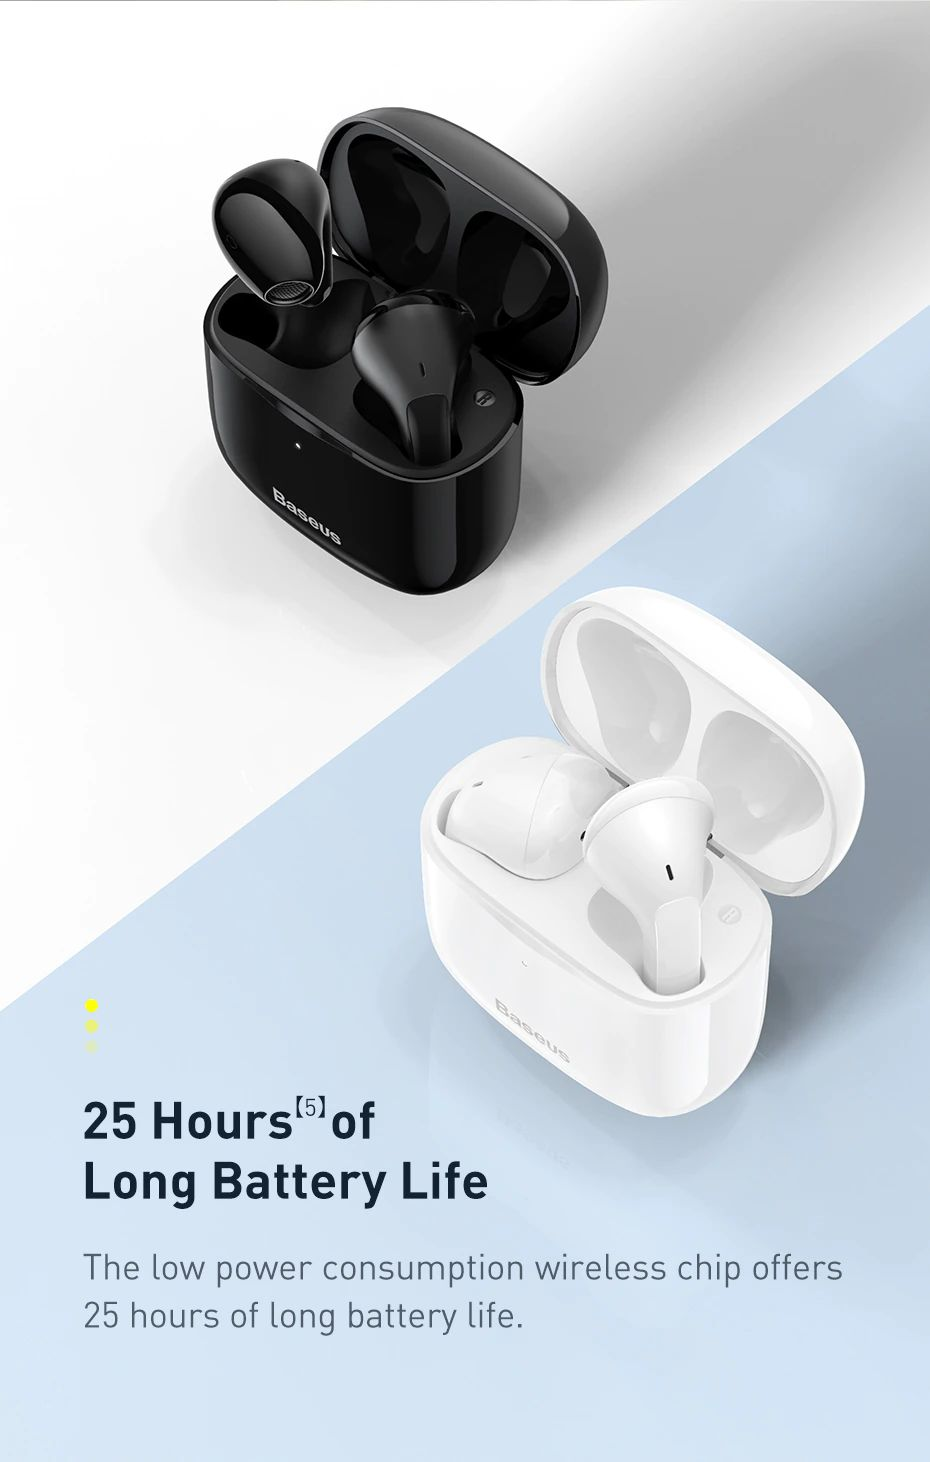 Baseus Bowie E3 Bluetooth Wireless Earphones (5)